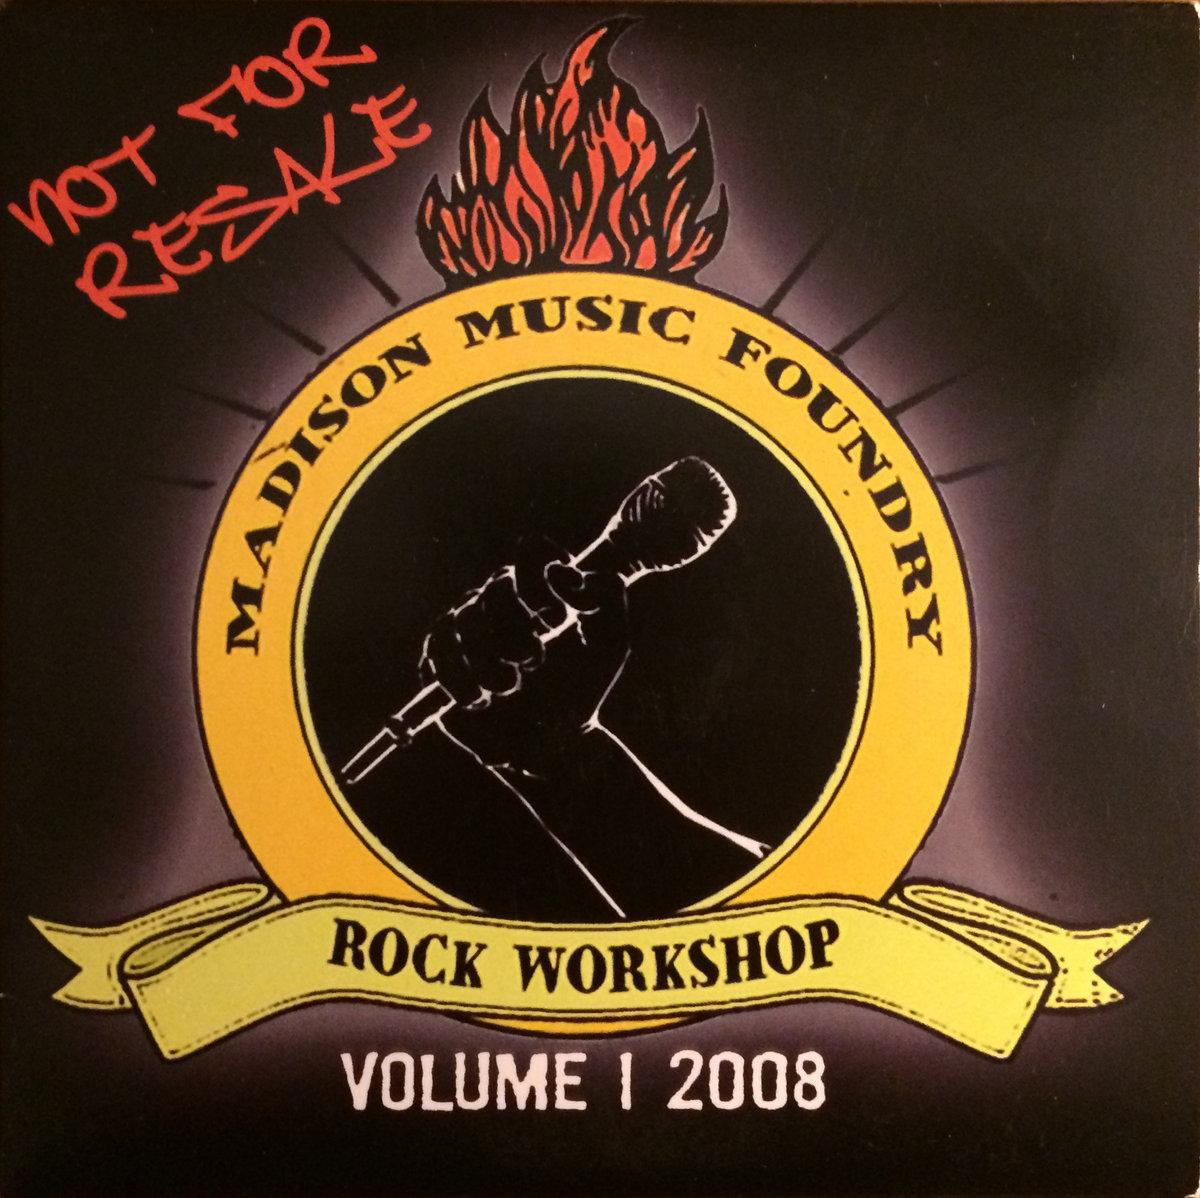 Rock Workshop Vol I Madison Music Foundry